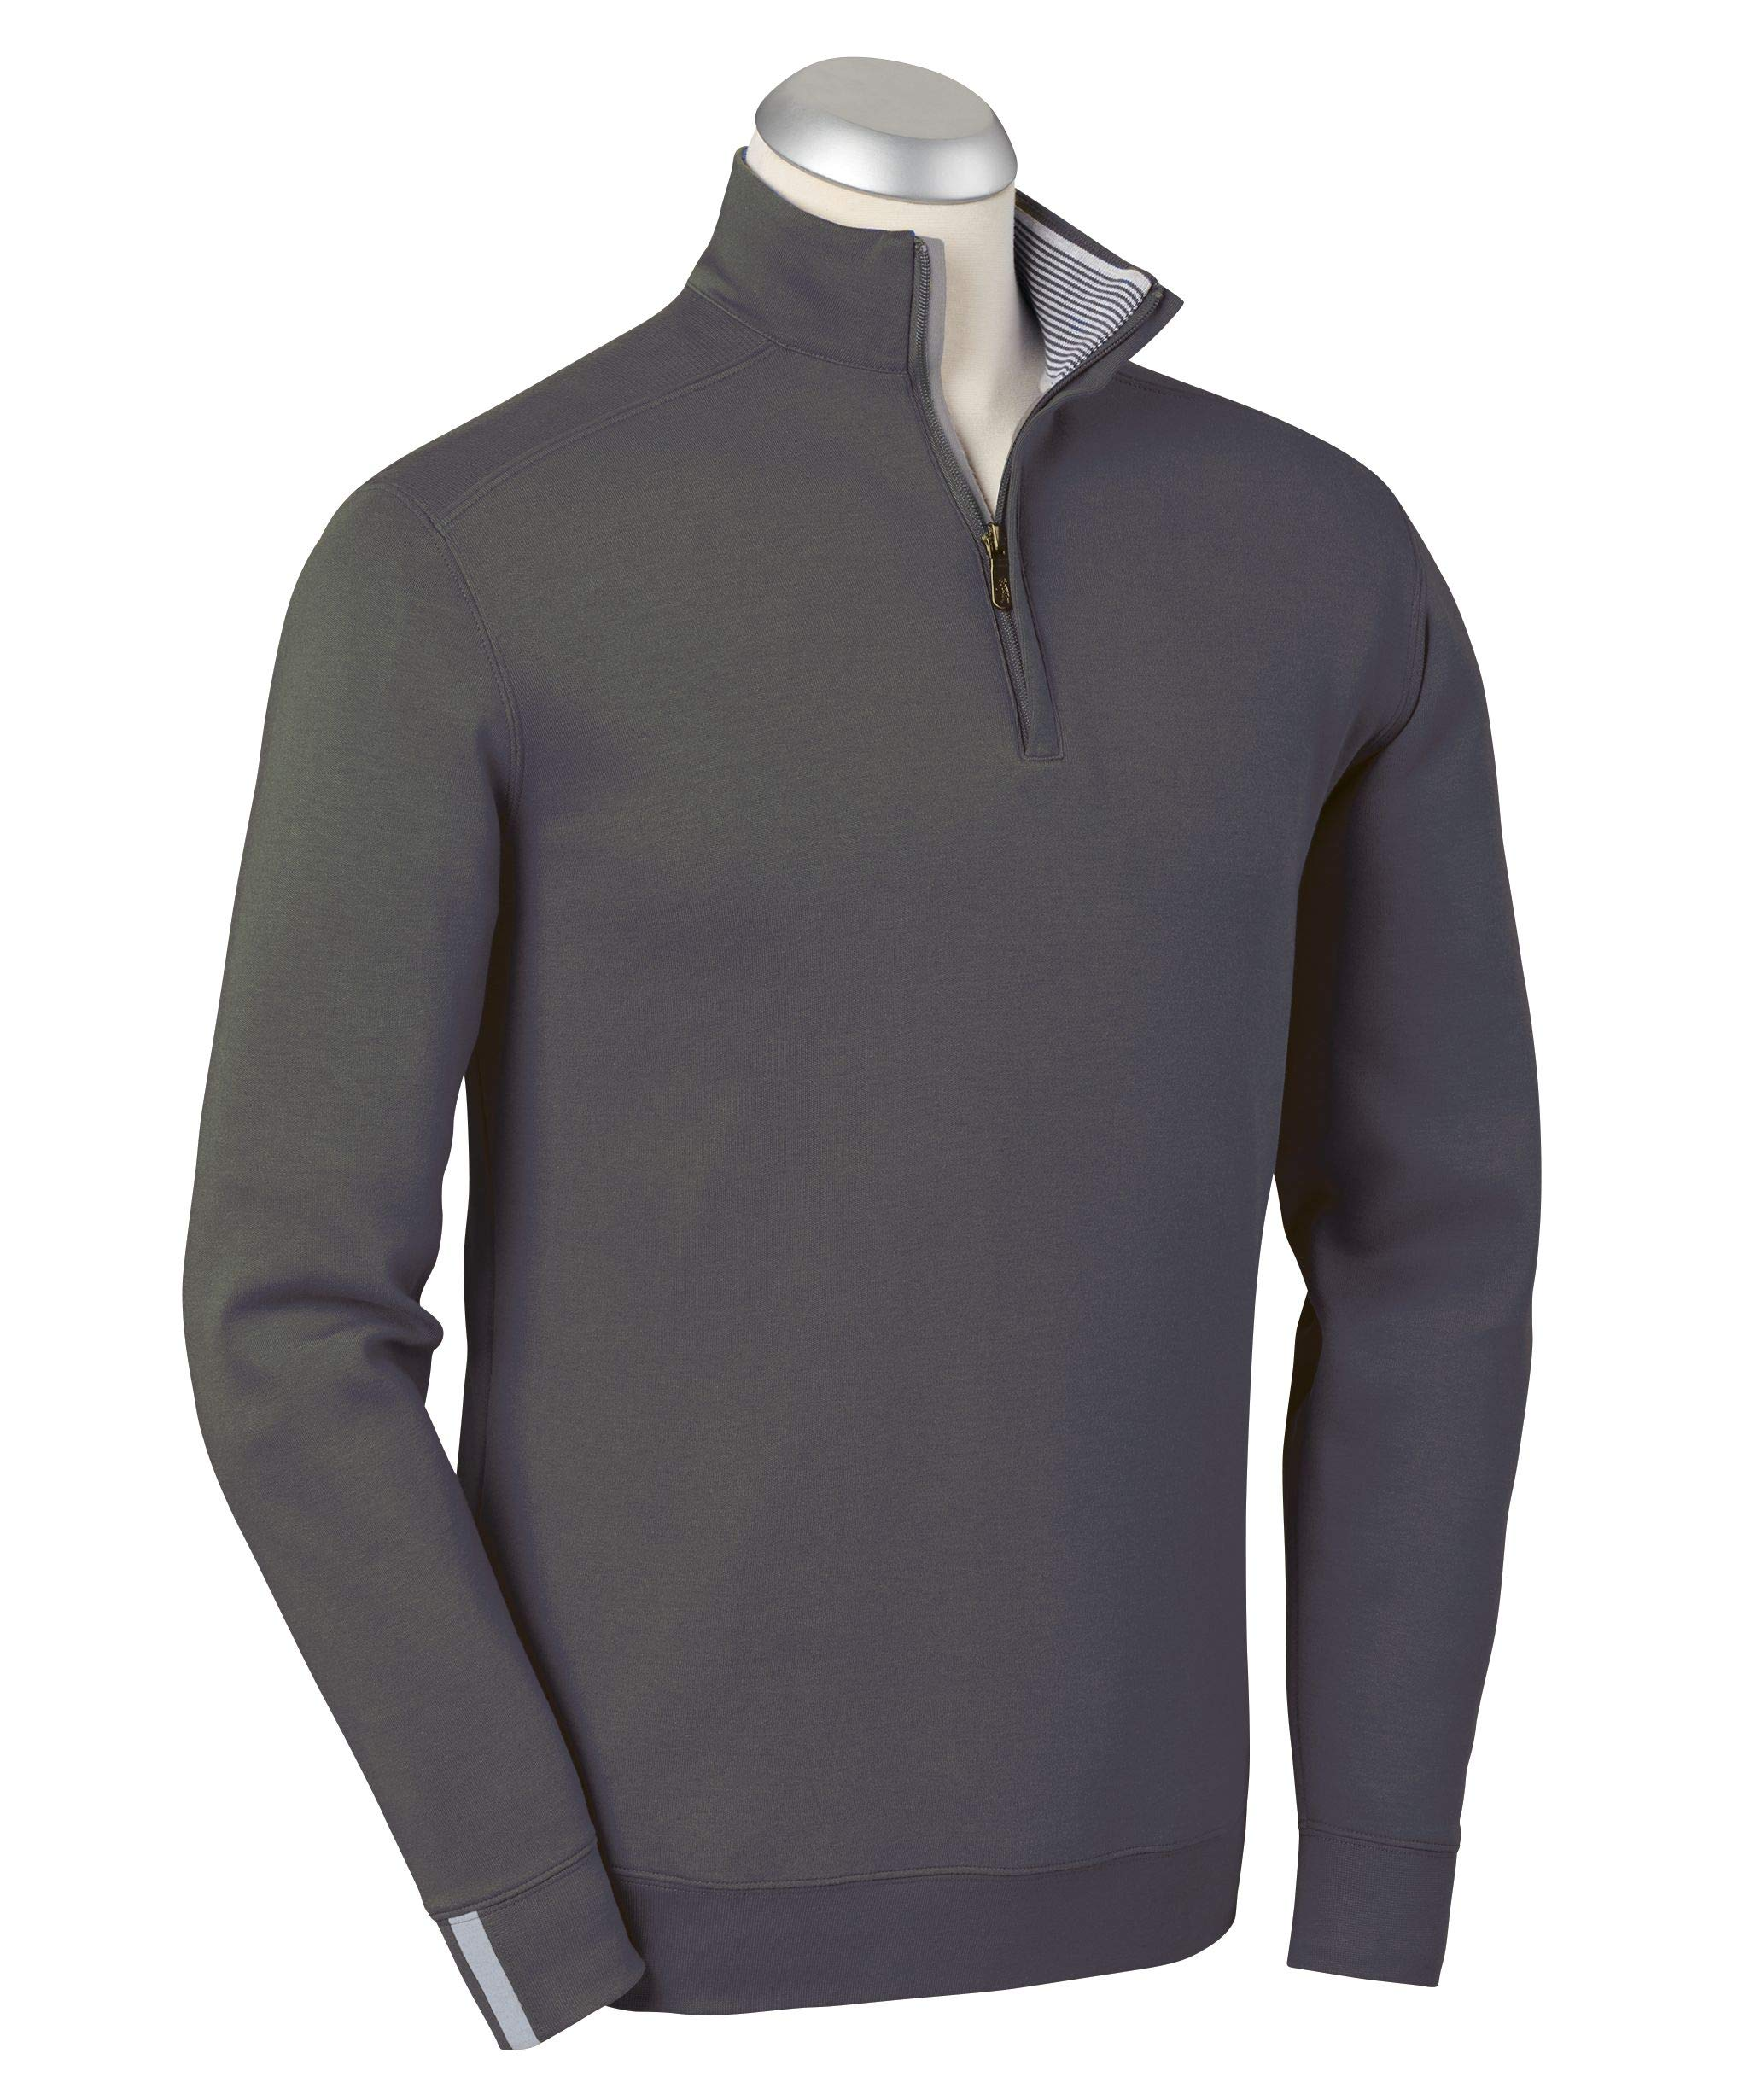 Bobby Jones Lux Pima Leaderboard Golf Pullover - Men's 1/4 Zip Pullover Golf Apparel Charcoal Heather by Bobby Jones